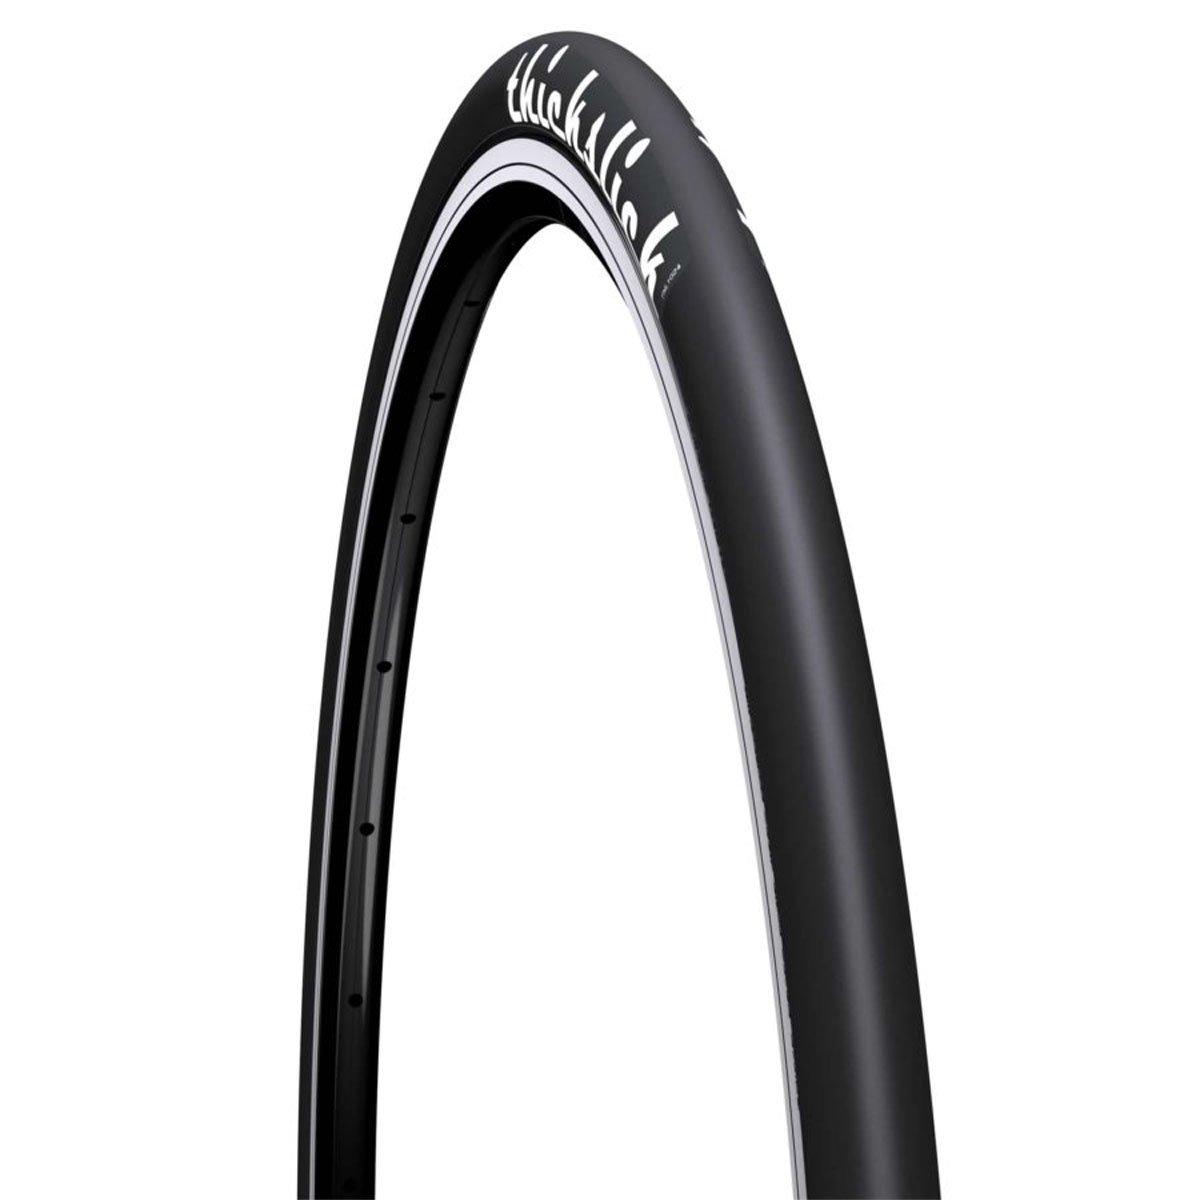 Amazon.com : WTB ThickSlick Flat Guard Road Tire - 25mm, 28mm : Sports & Outdoors